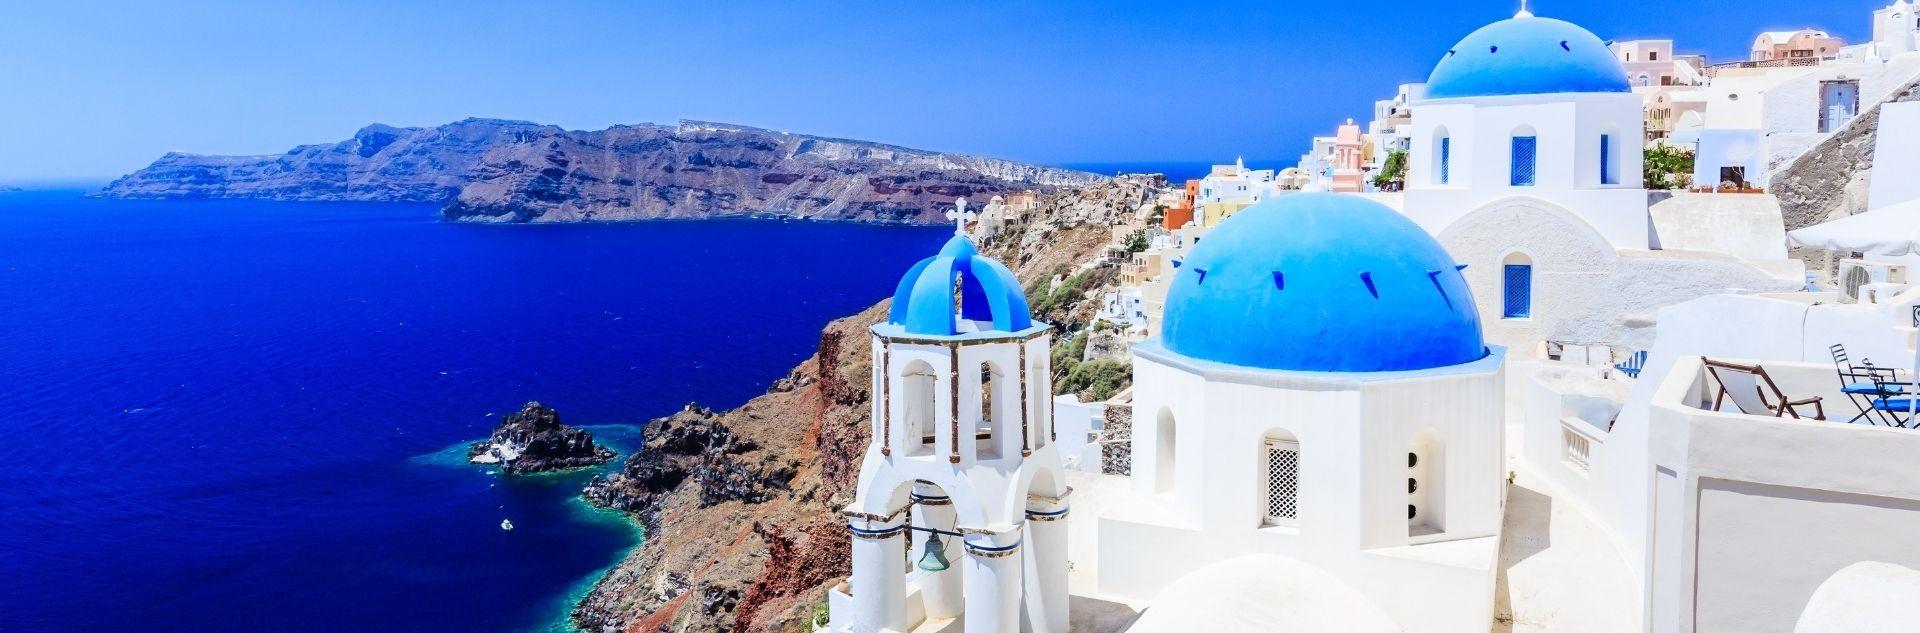 Griechische Inseln - Santorin